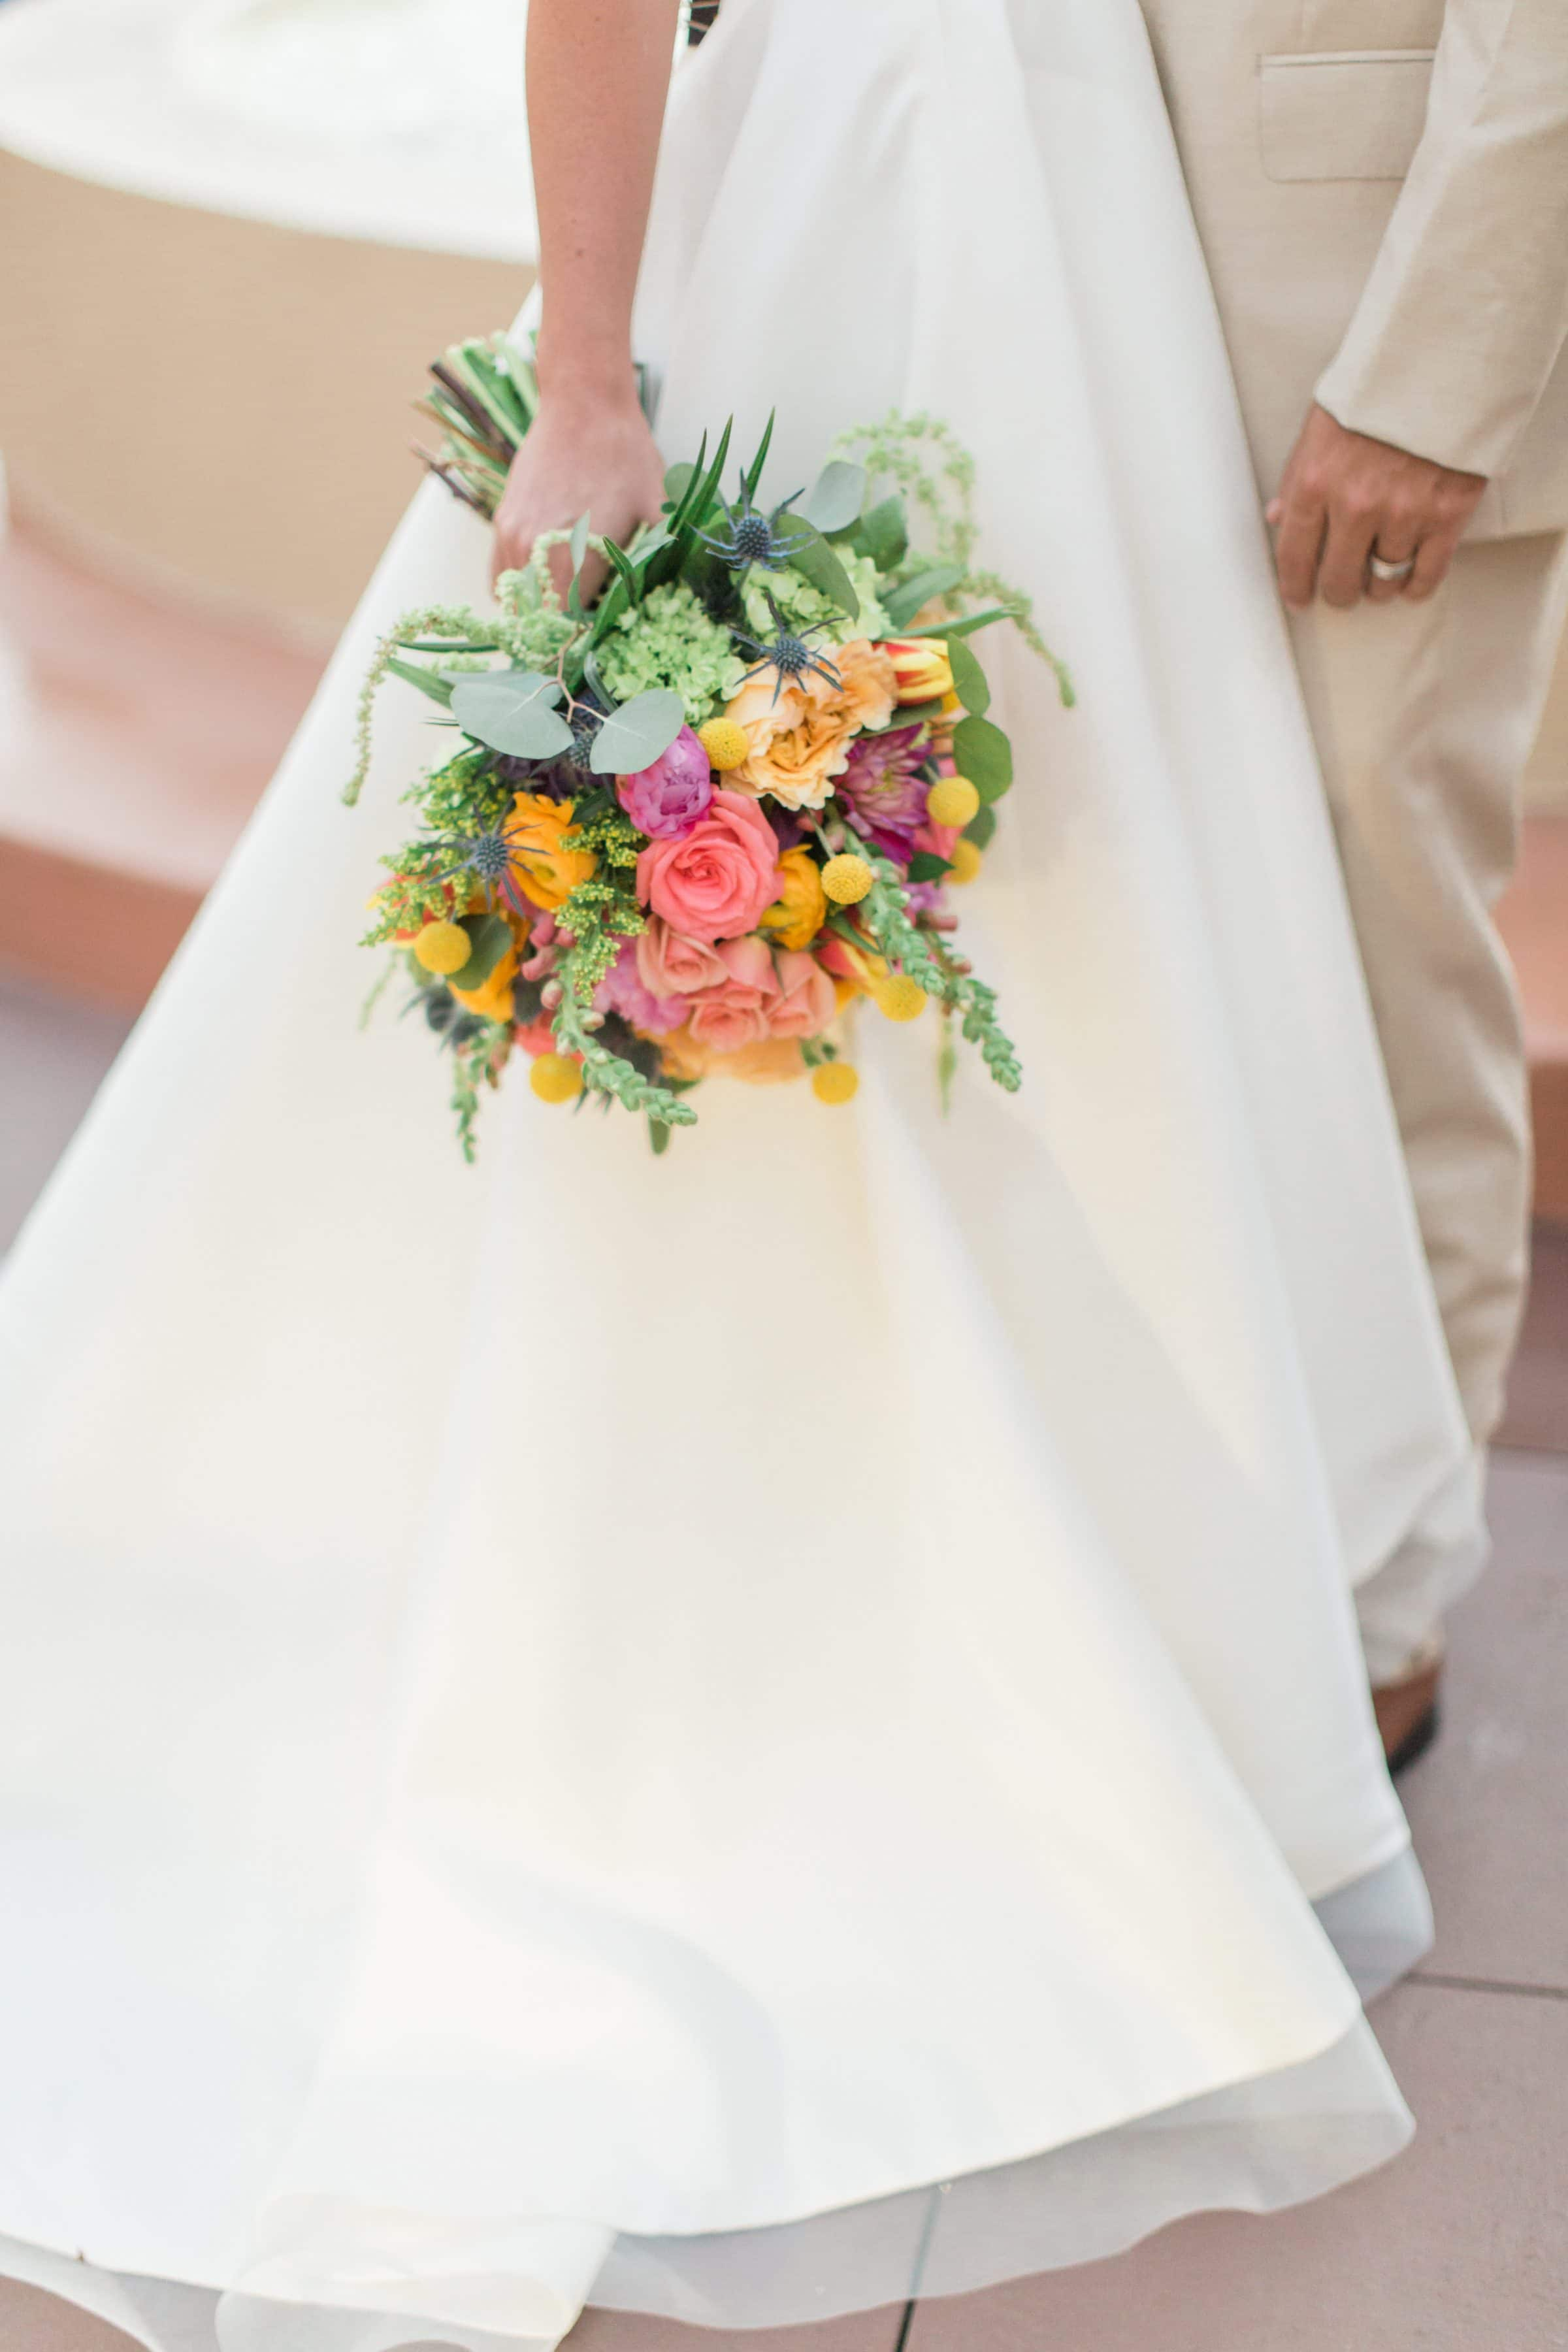 Bride Holding Sensational Spring Wedding Bouquet